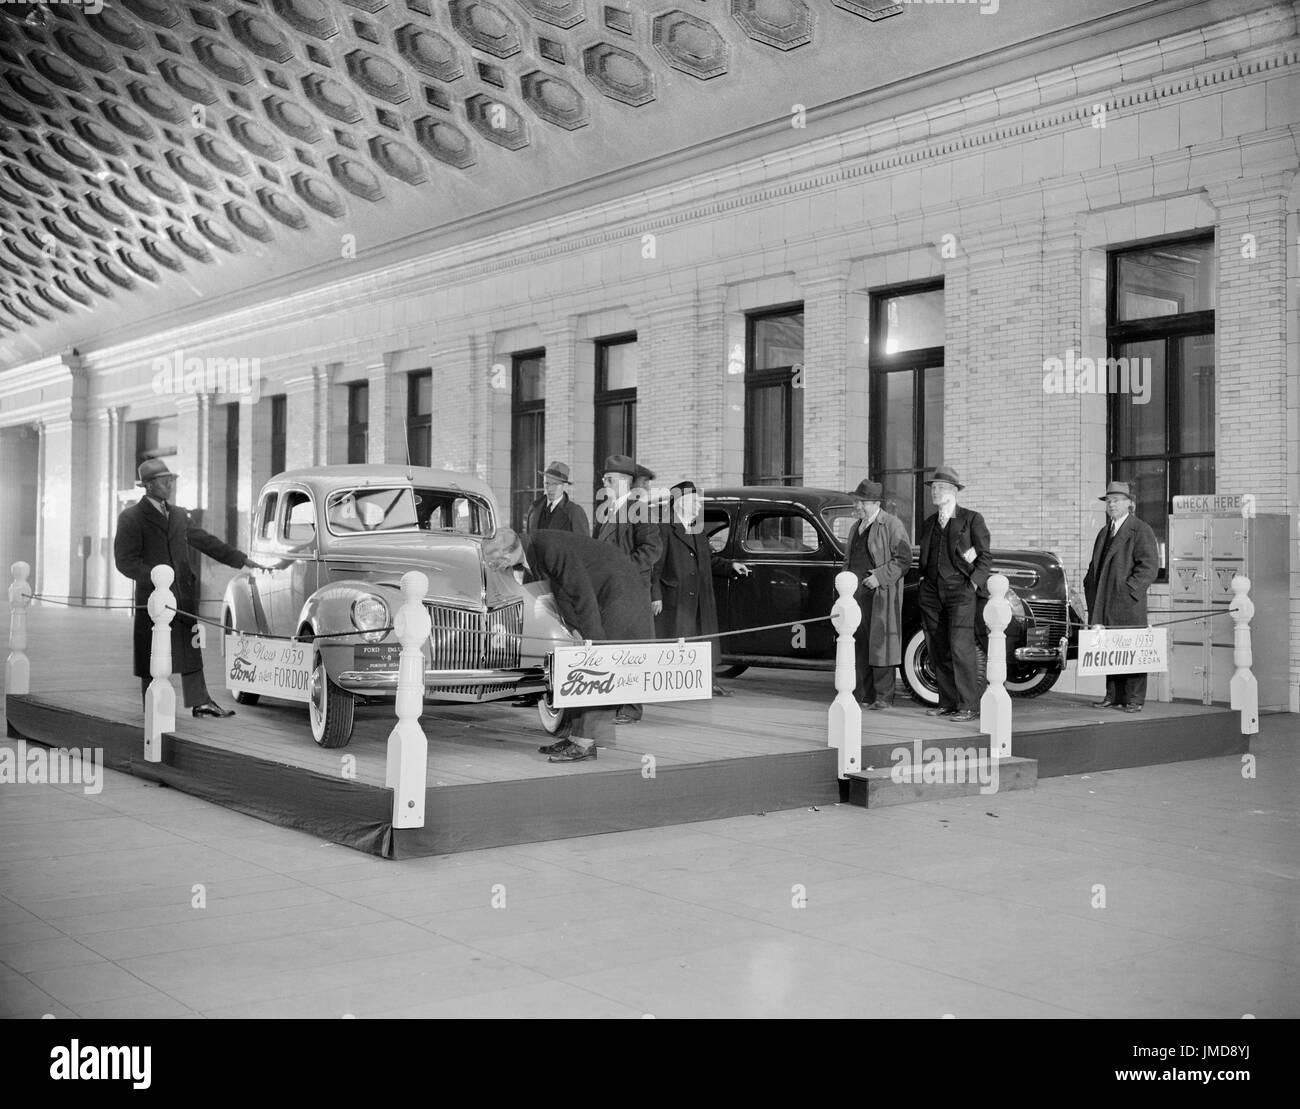 Union Vintage Cars Stock Photos & Union Vintage Cars Stock Images ...